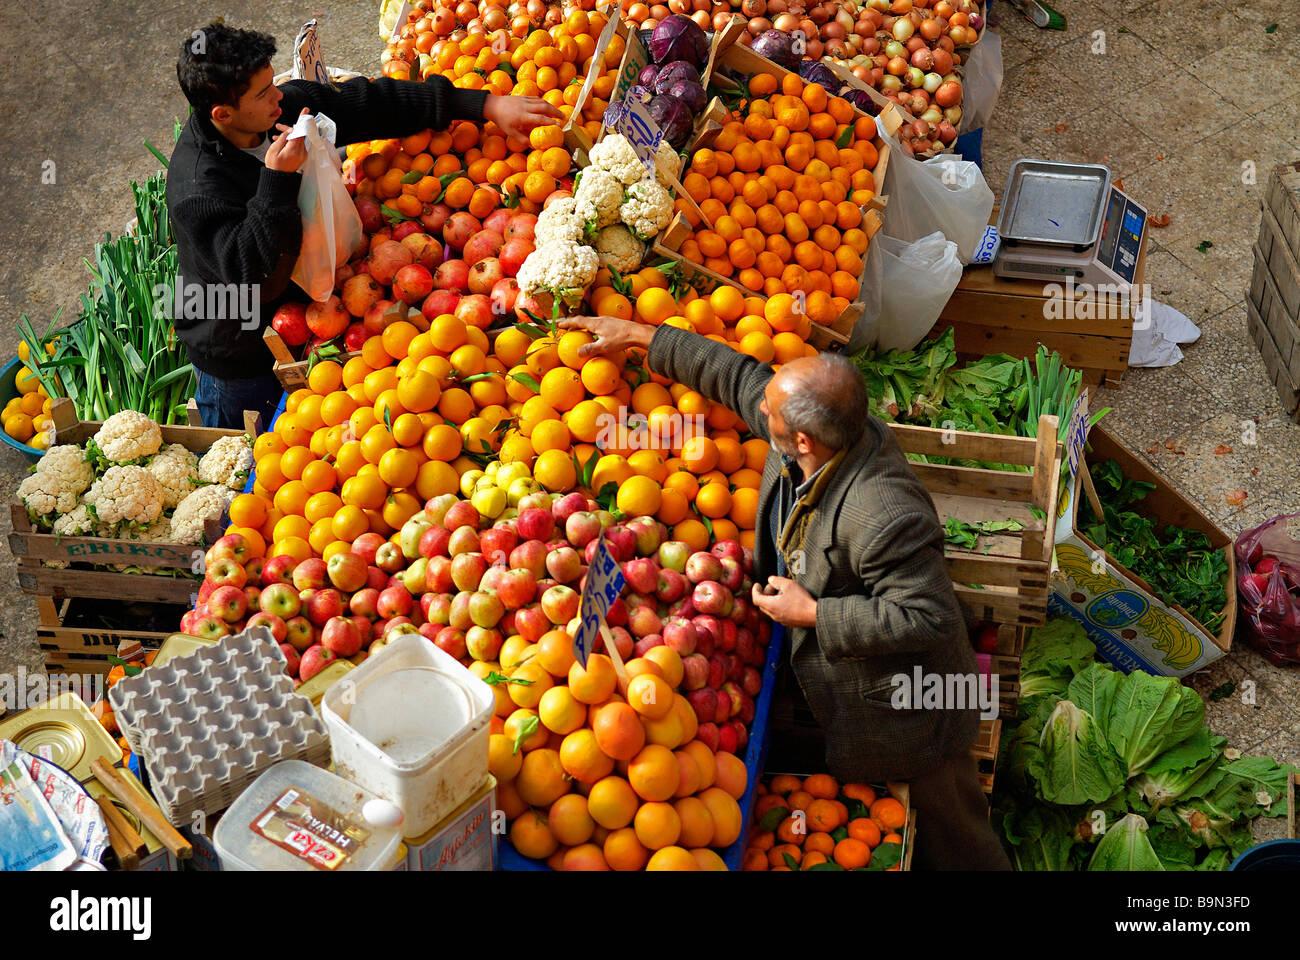 Turkey, Central Anatolia, Konya, vegetables and fruits market Stock Photo